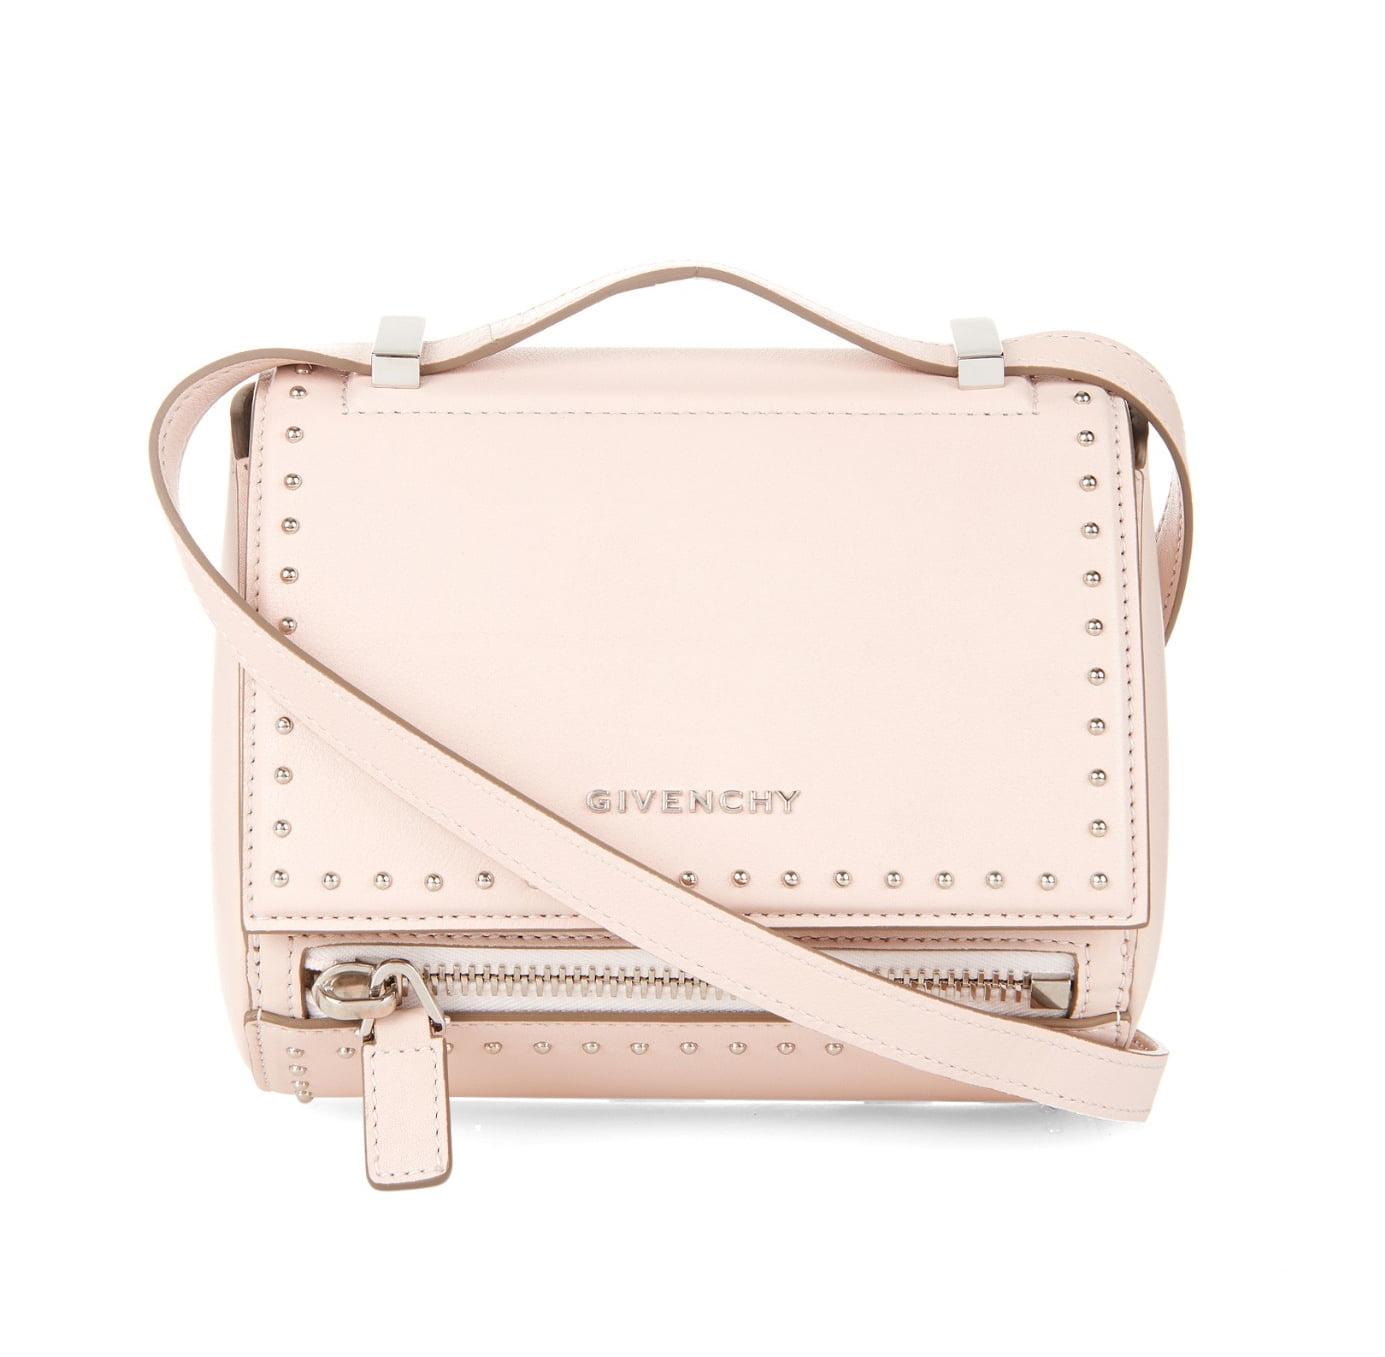 givenchy-light-pink-pandora-box-mini-leather-bag-pink-product-4-591846037-normal